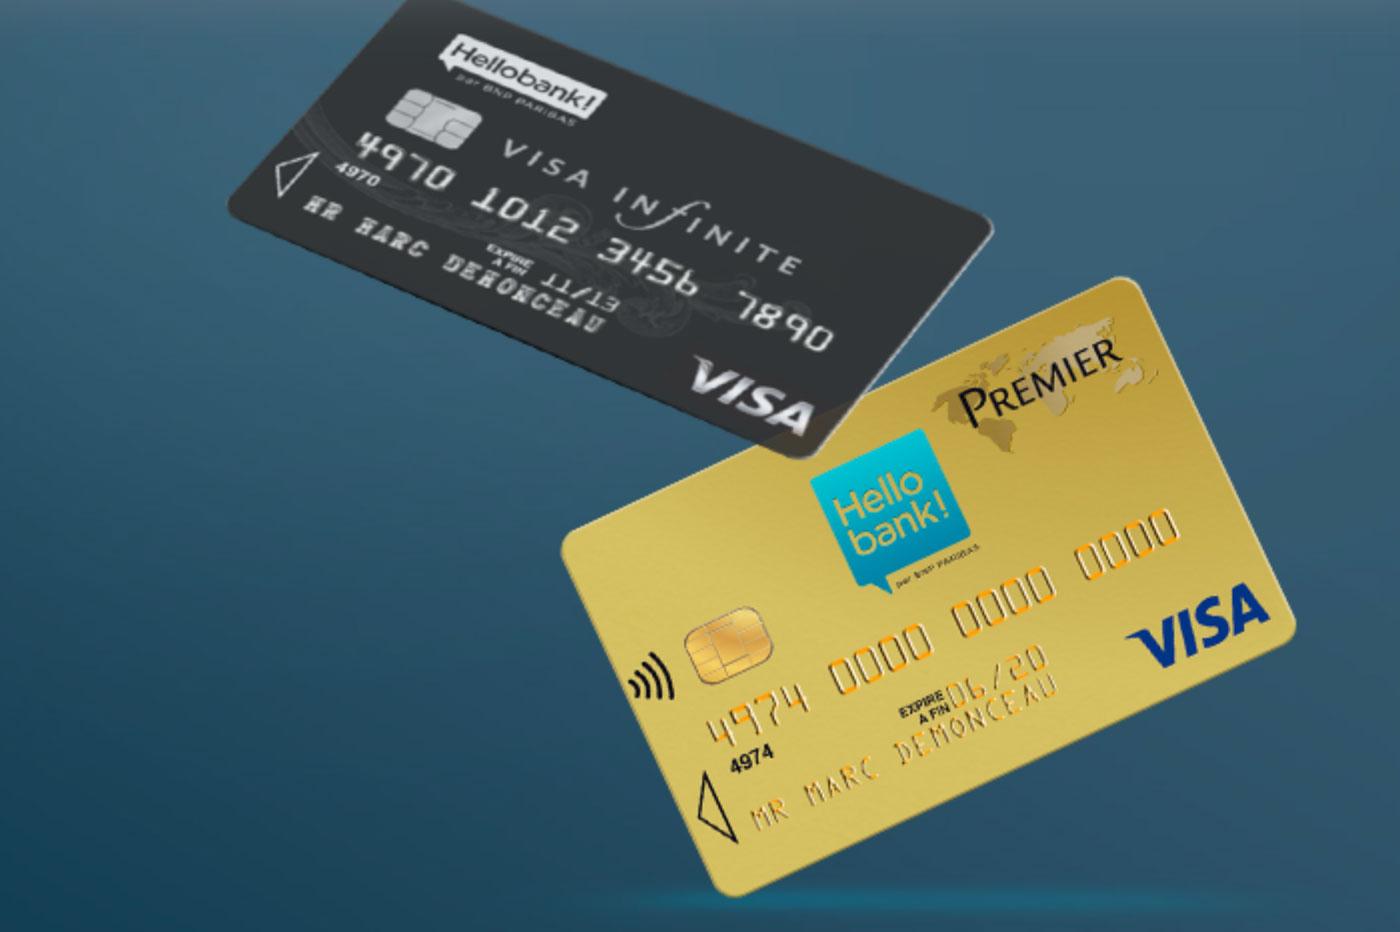 Comparaison: Hello bank! Visa Premier vs Visa Infinite